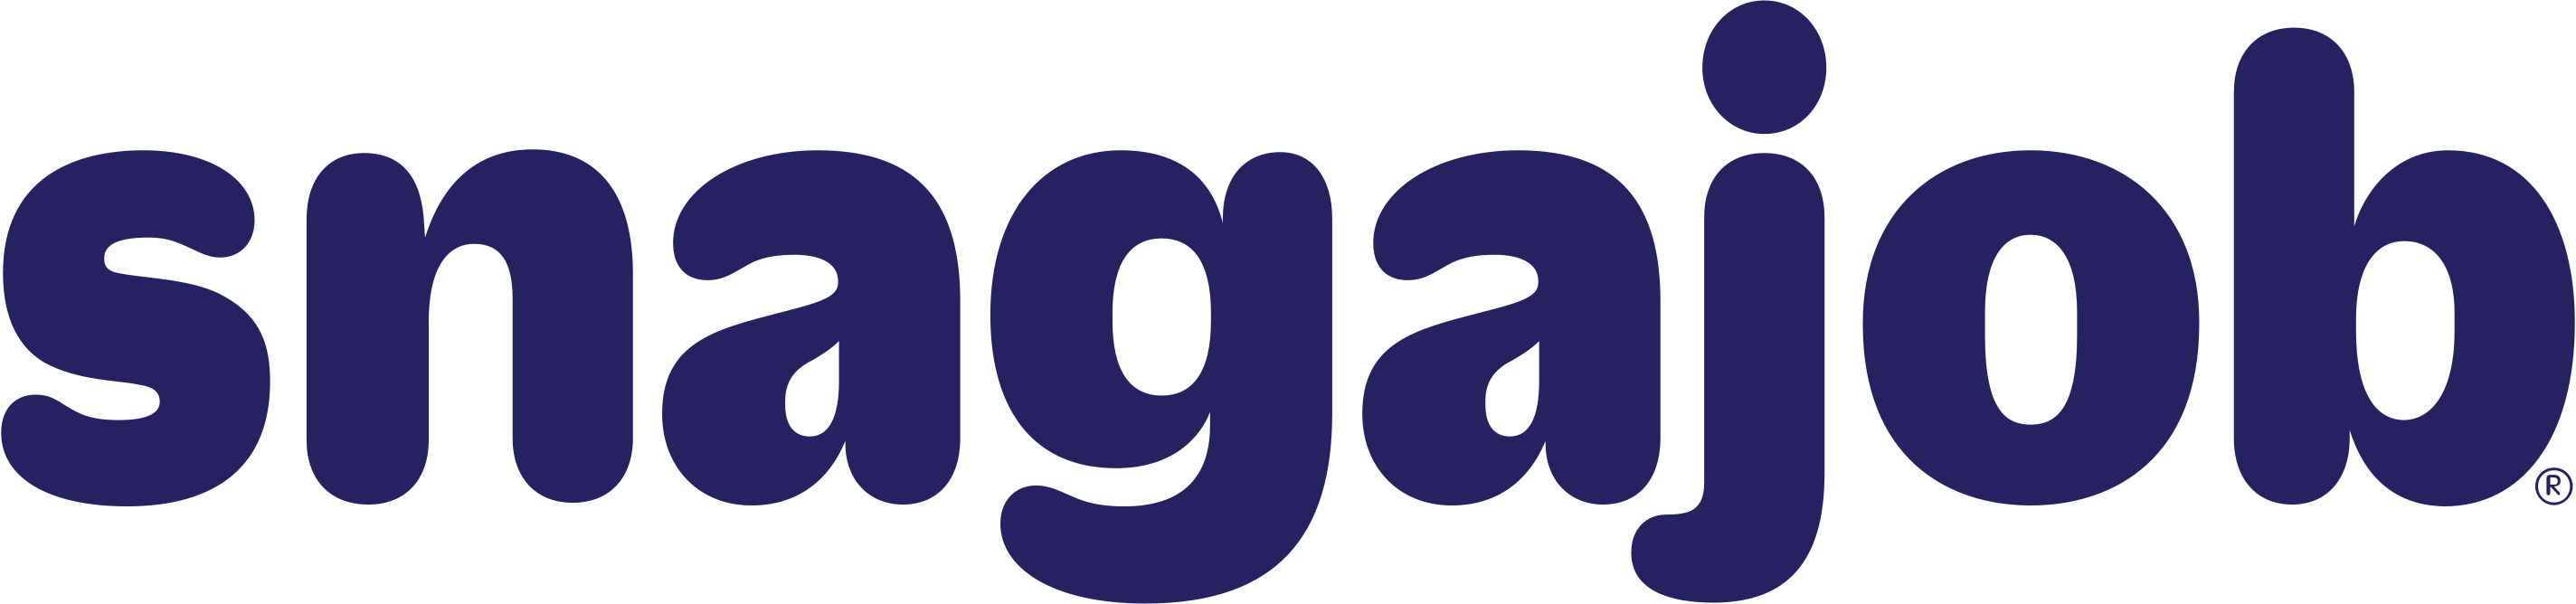 SnagAJob.com, Inc.